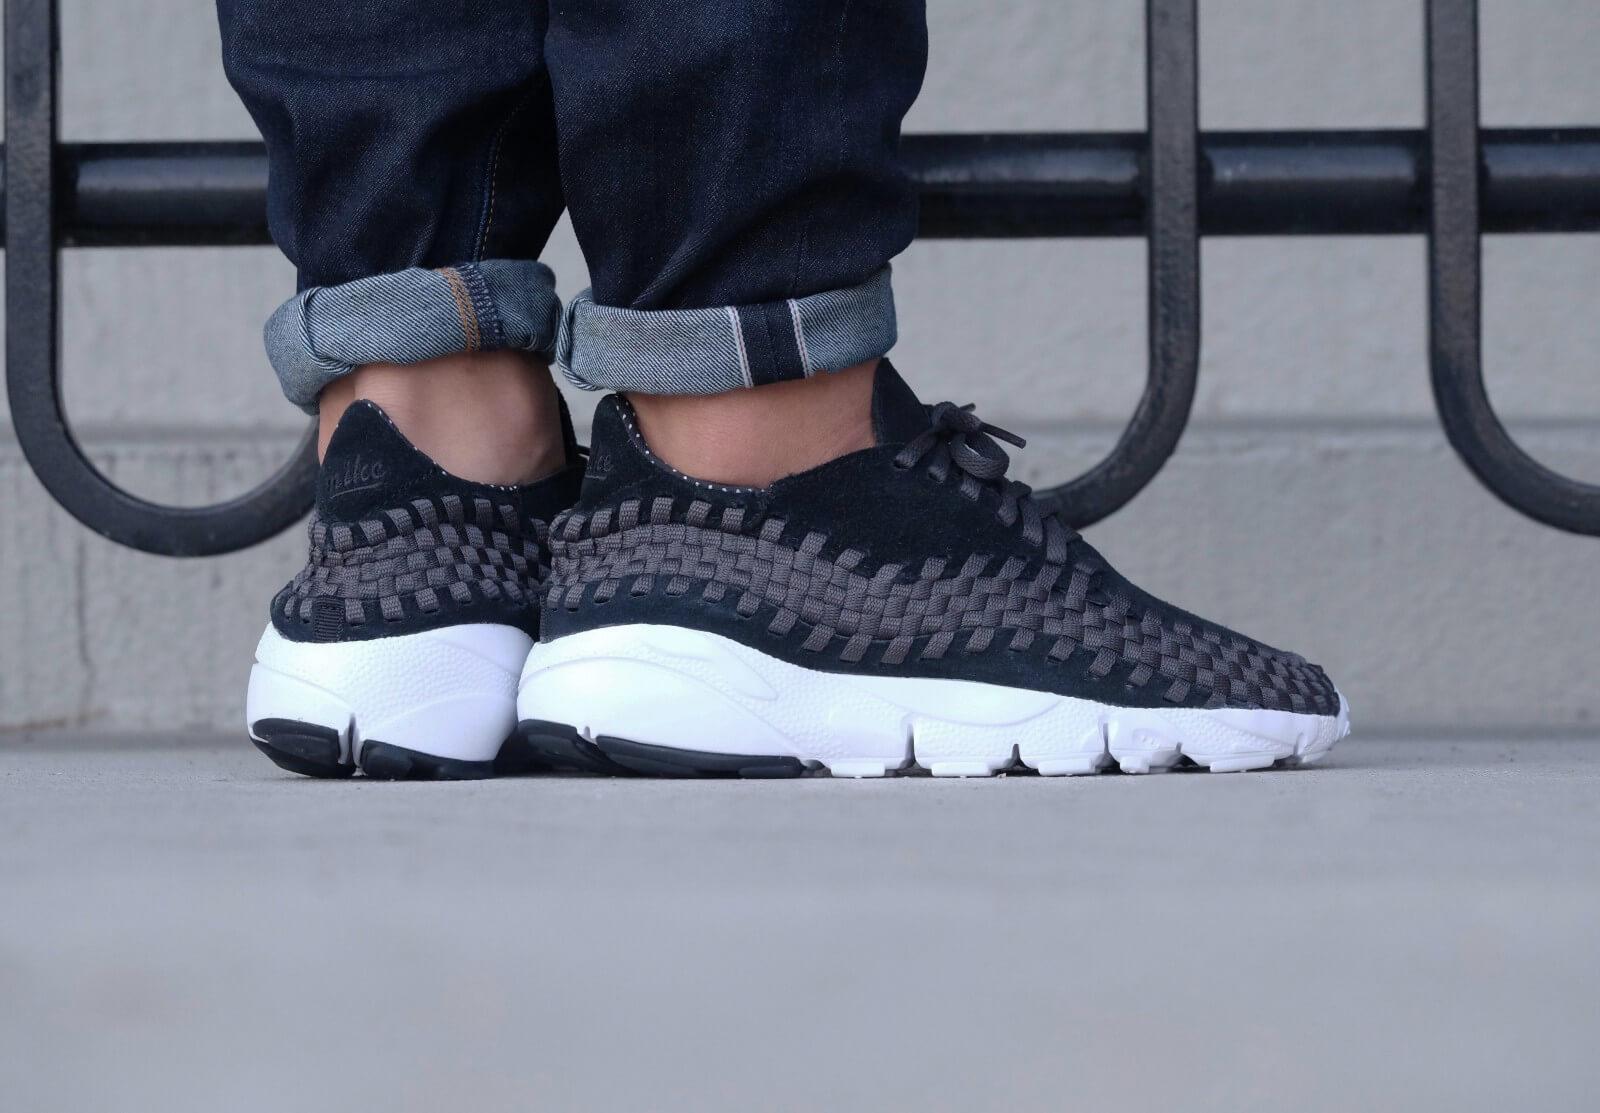 Monje polilla Mejorar  Nike Air Footscape Woven NM Black/Black-Anthracite-White - 875797-001